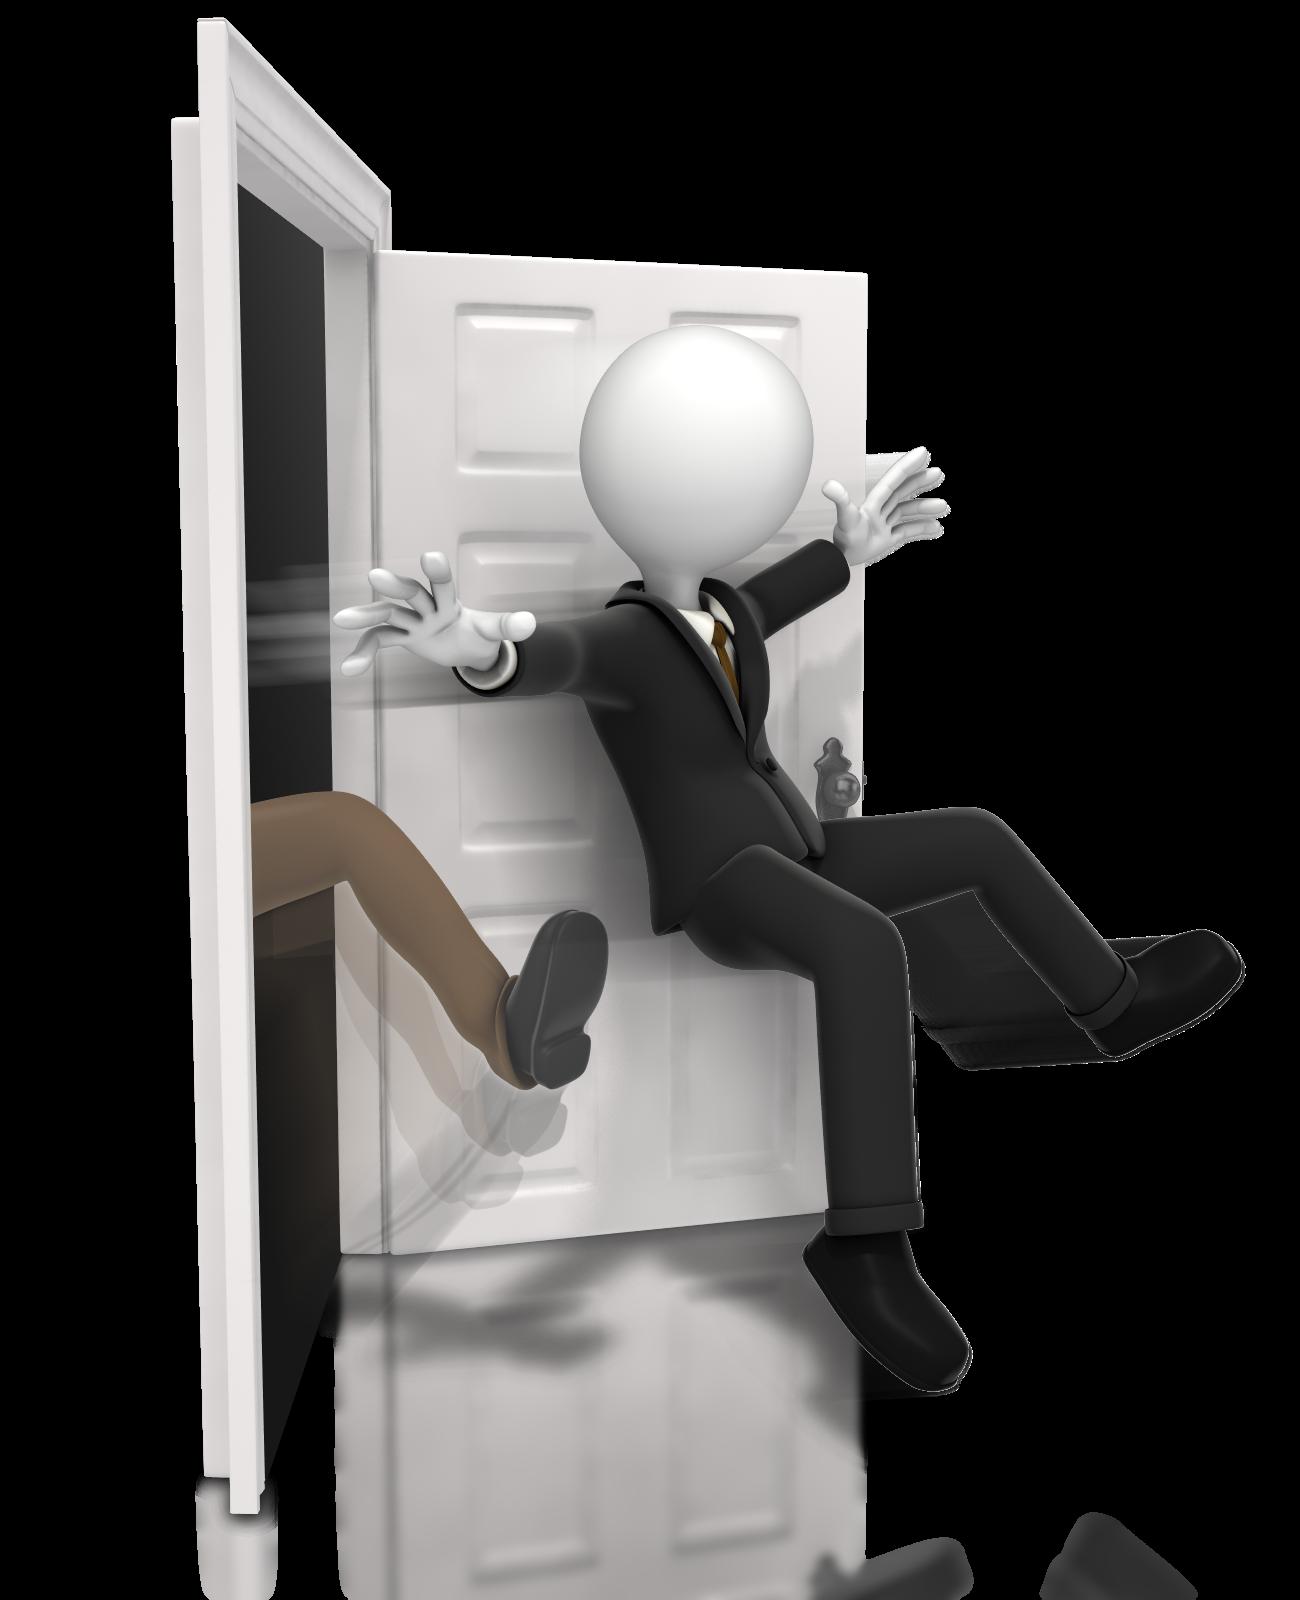 portal how to get through closed doors